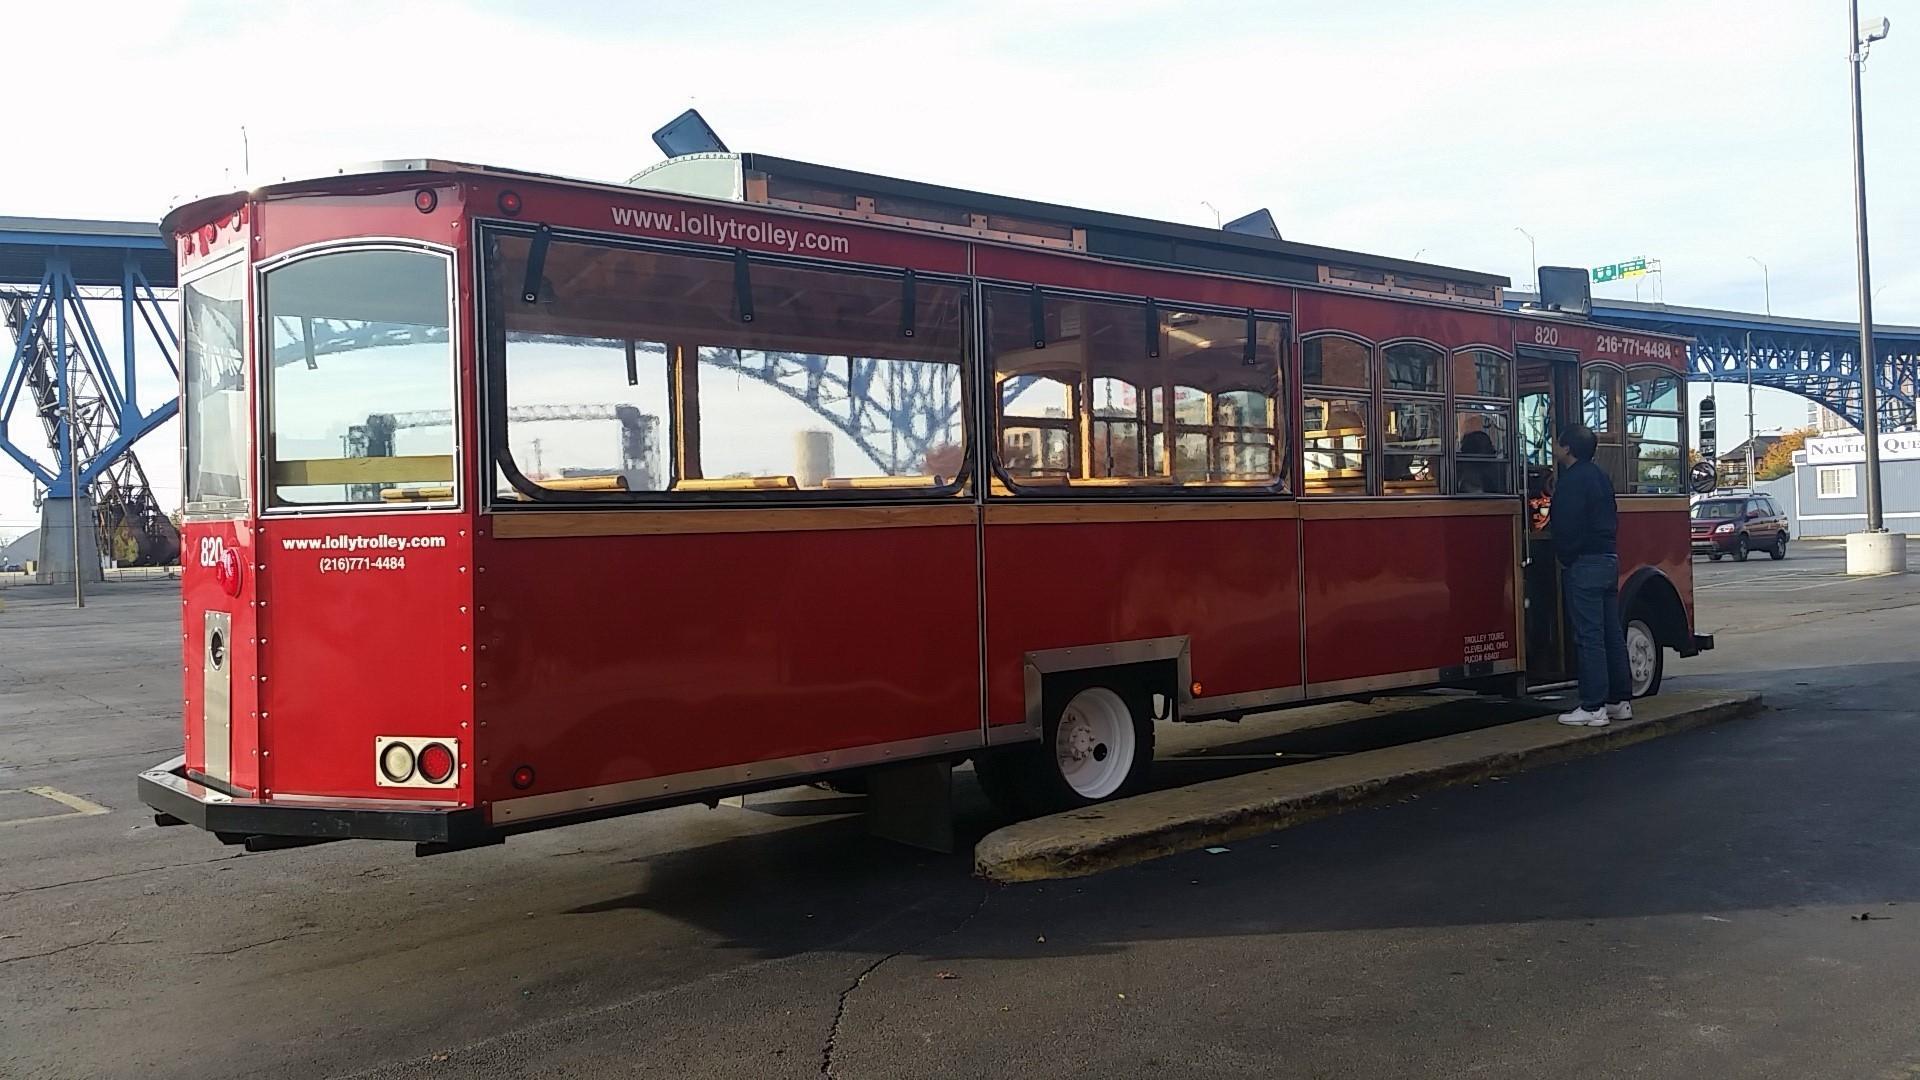 Holiday Lights Trolley Tour Boise Lifehacked1st Com